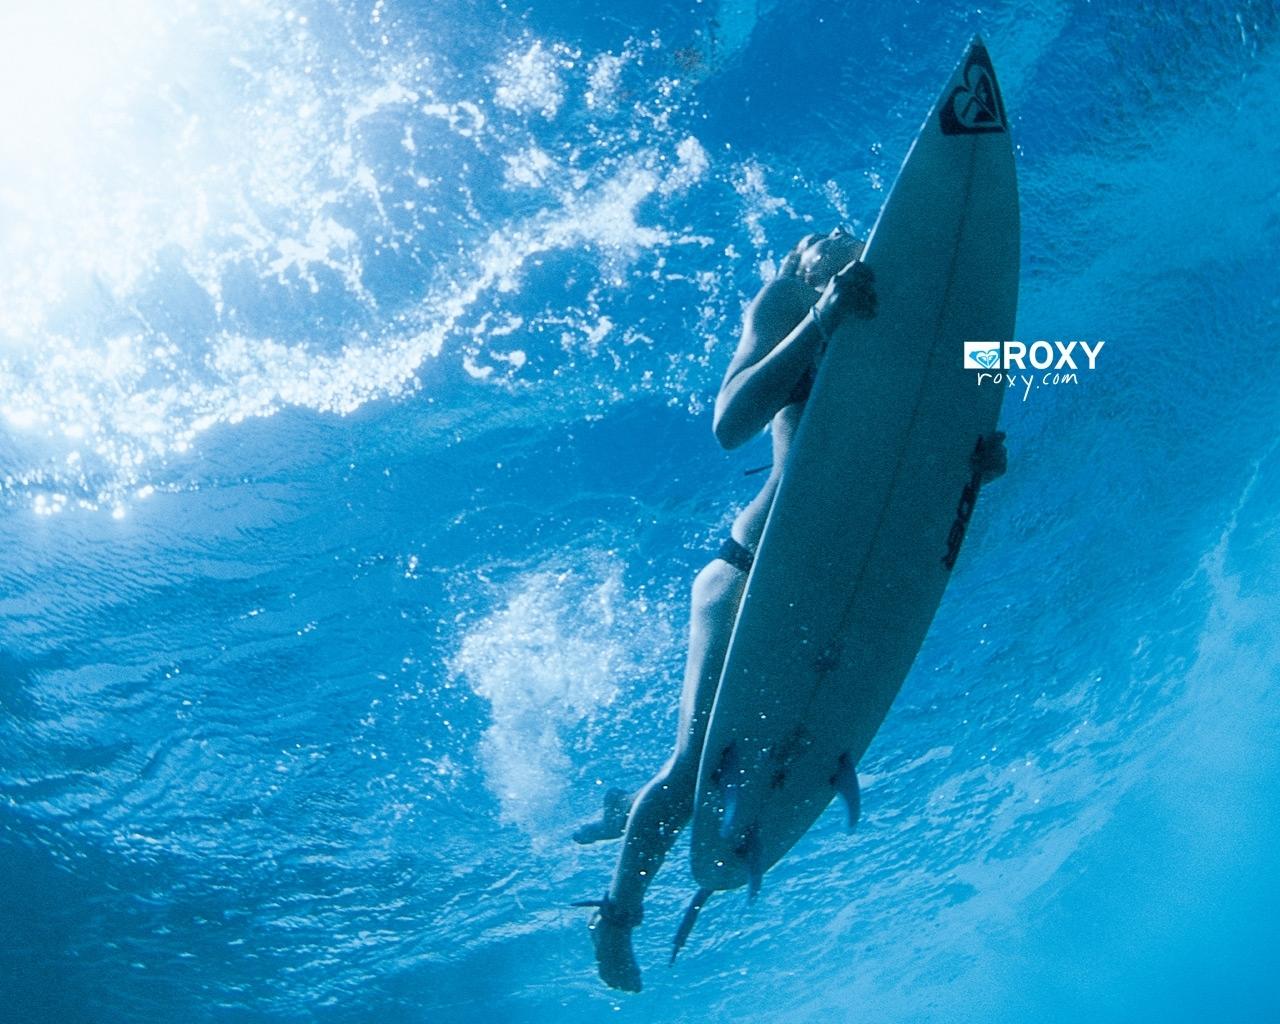 winter surfing roxy wallpaper - photo #33